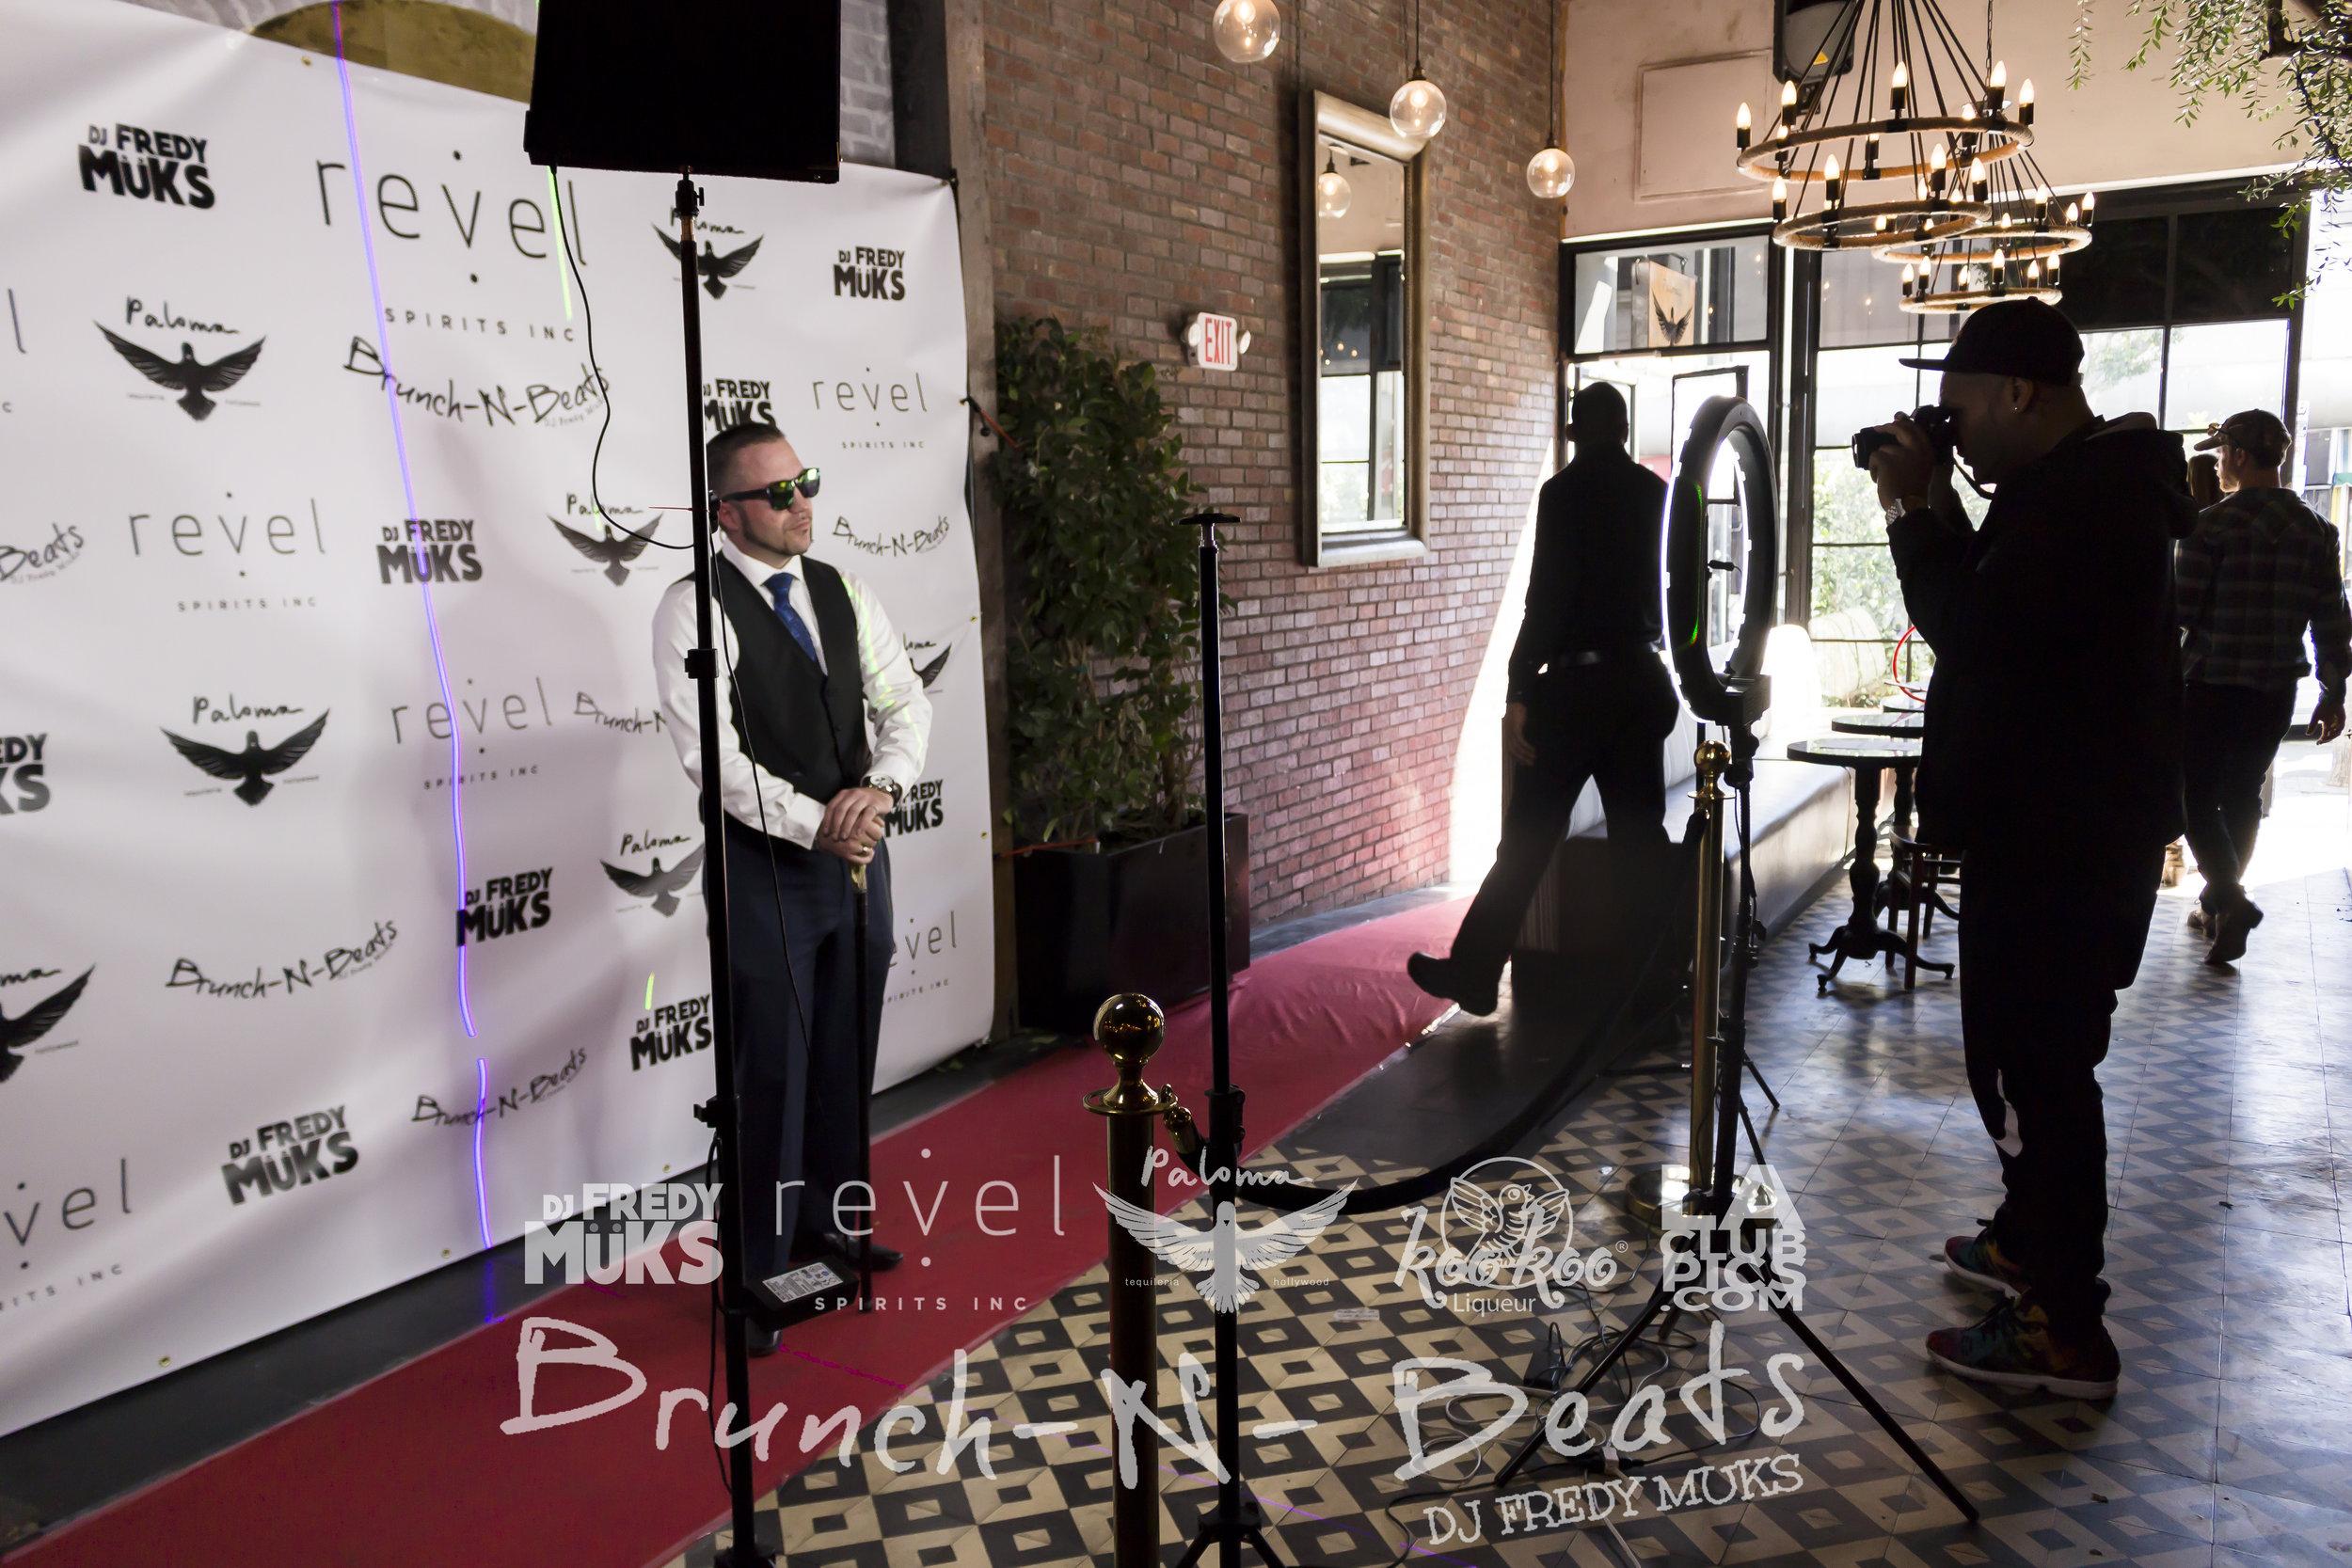 Brunch-N-Beats - Paloma Hollywood - 02-25-18_19.jpg